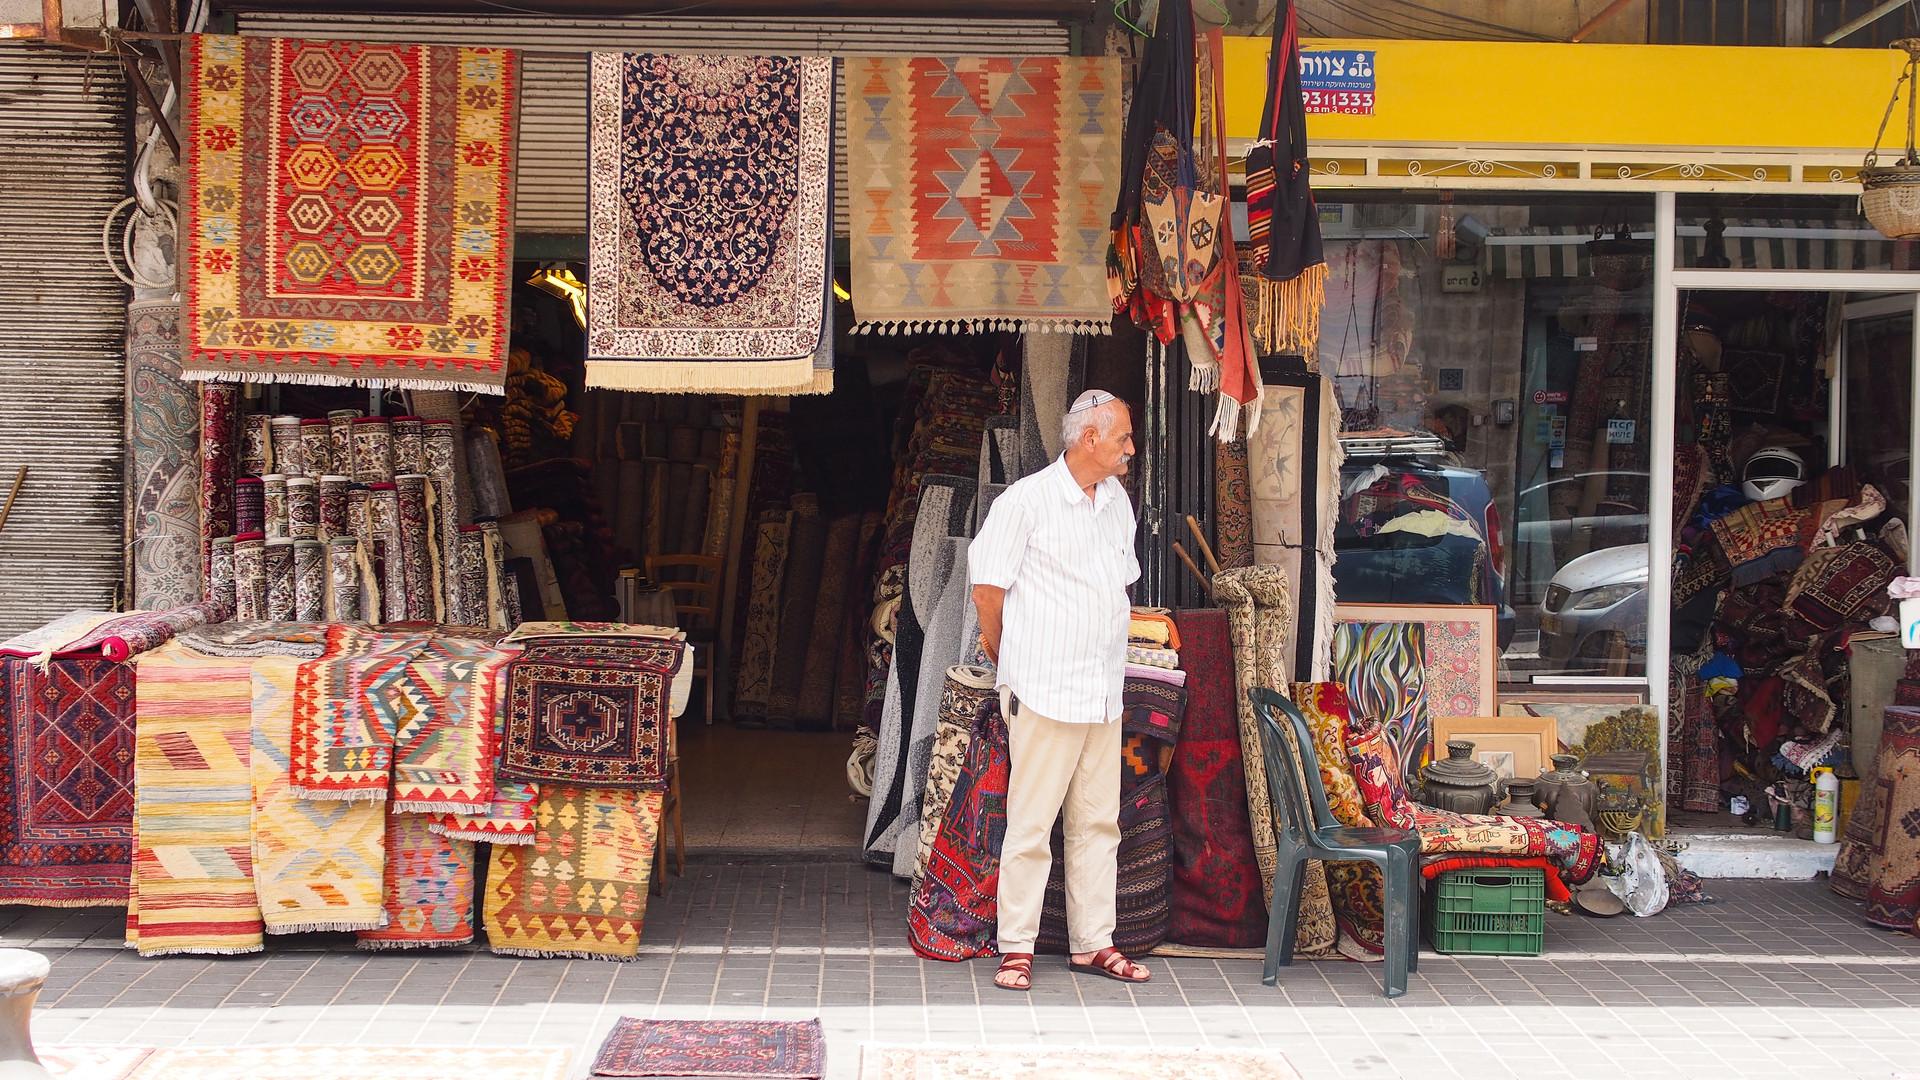 Flea Market, Old Jaffa, Tel Aviv 2018.05.23